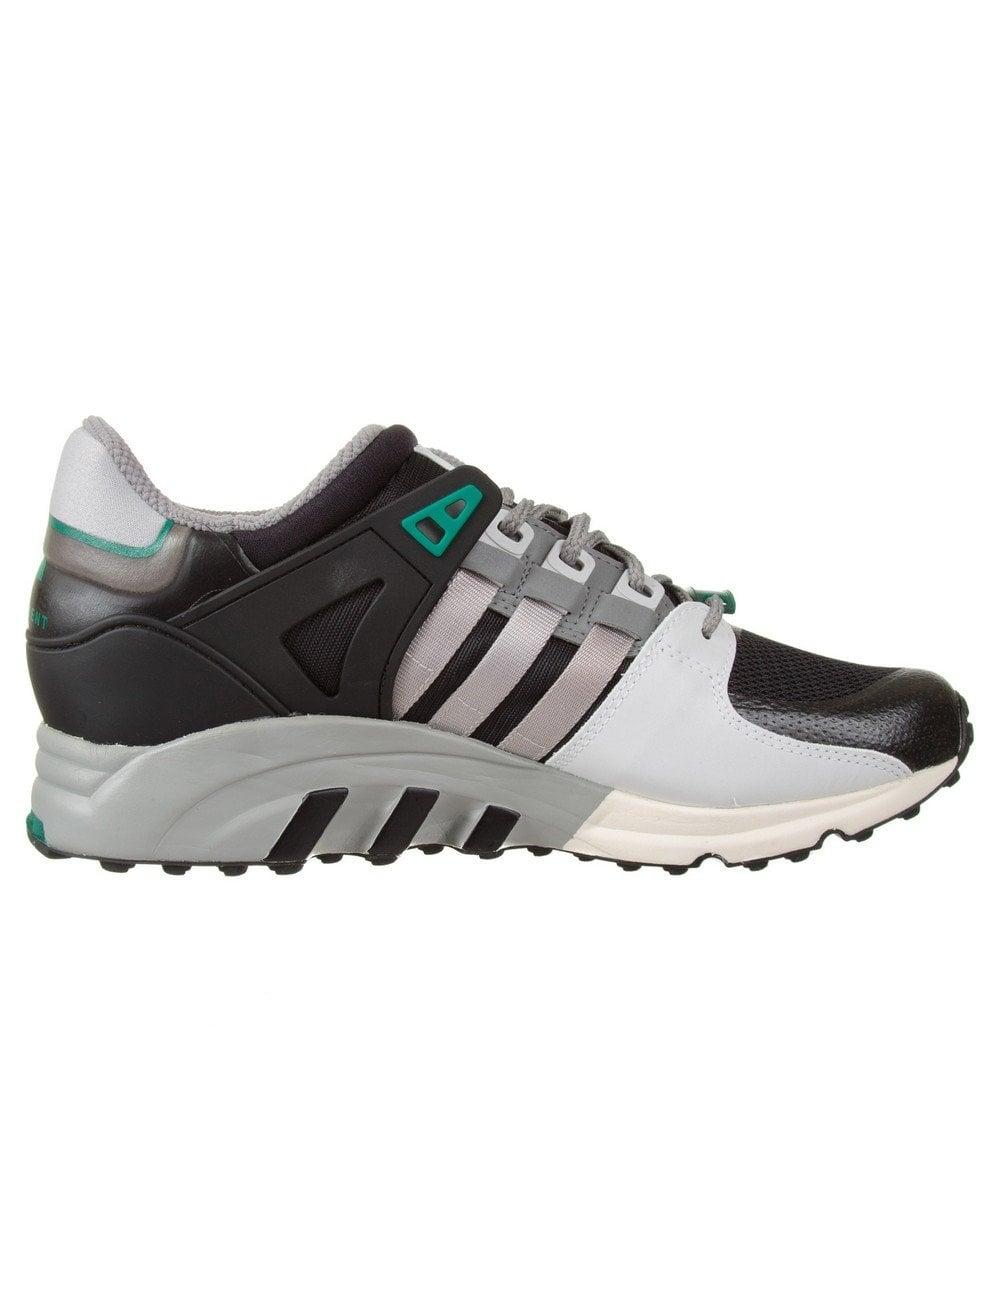 A bordo Falsedad restaurante  Adidas Originals Equipment Running M25107 Shoes - Core Black/Lt Solid Grey  - Footwear from Fat Buddha Store UK